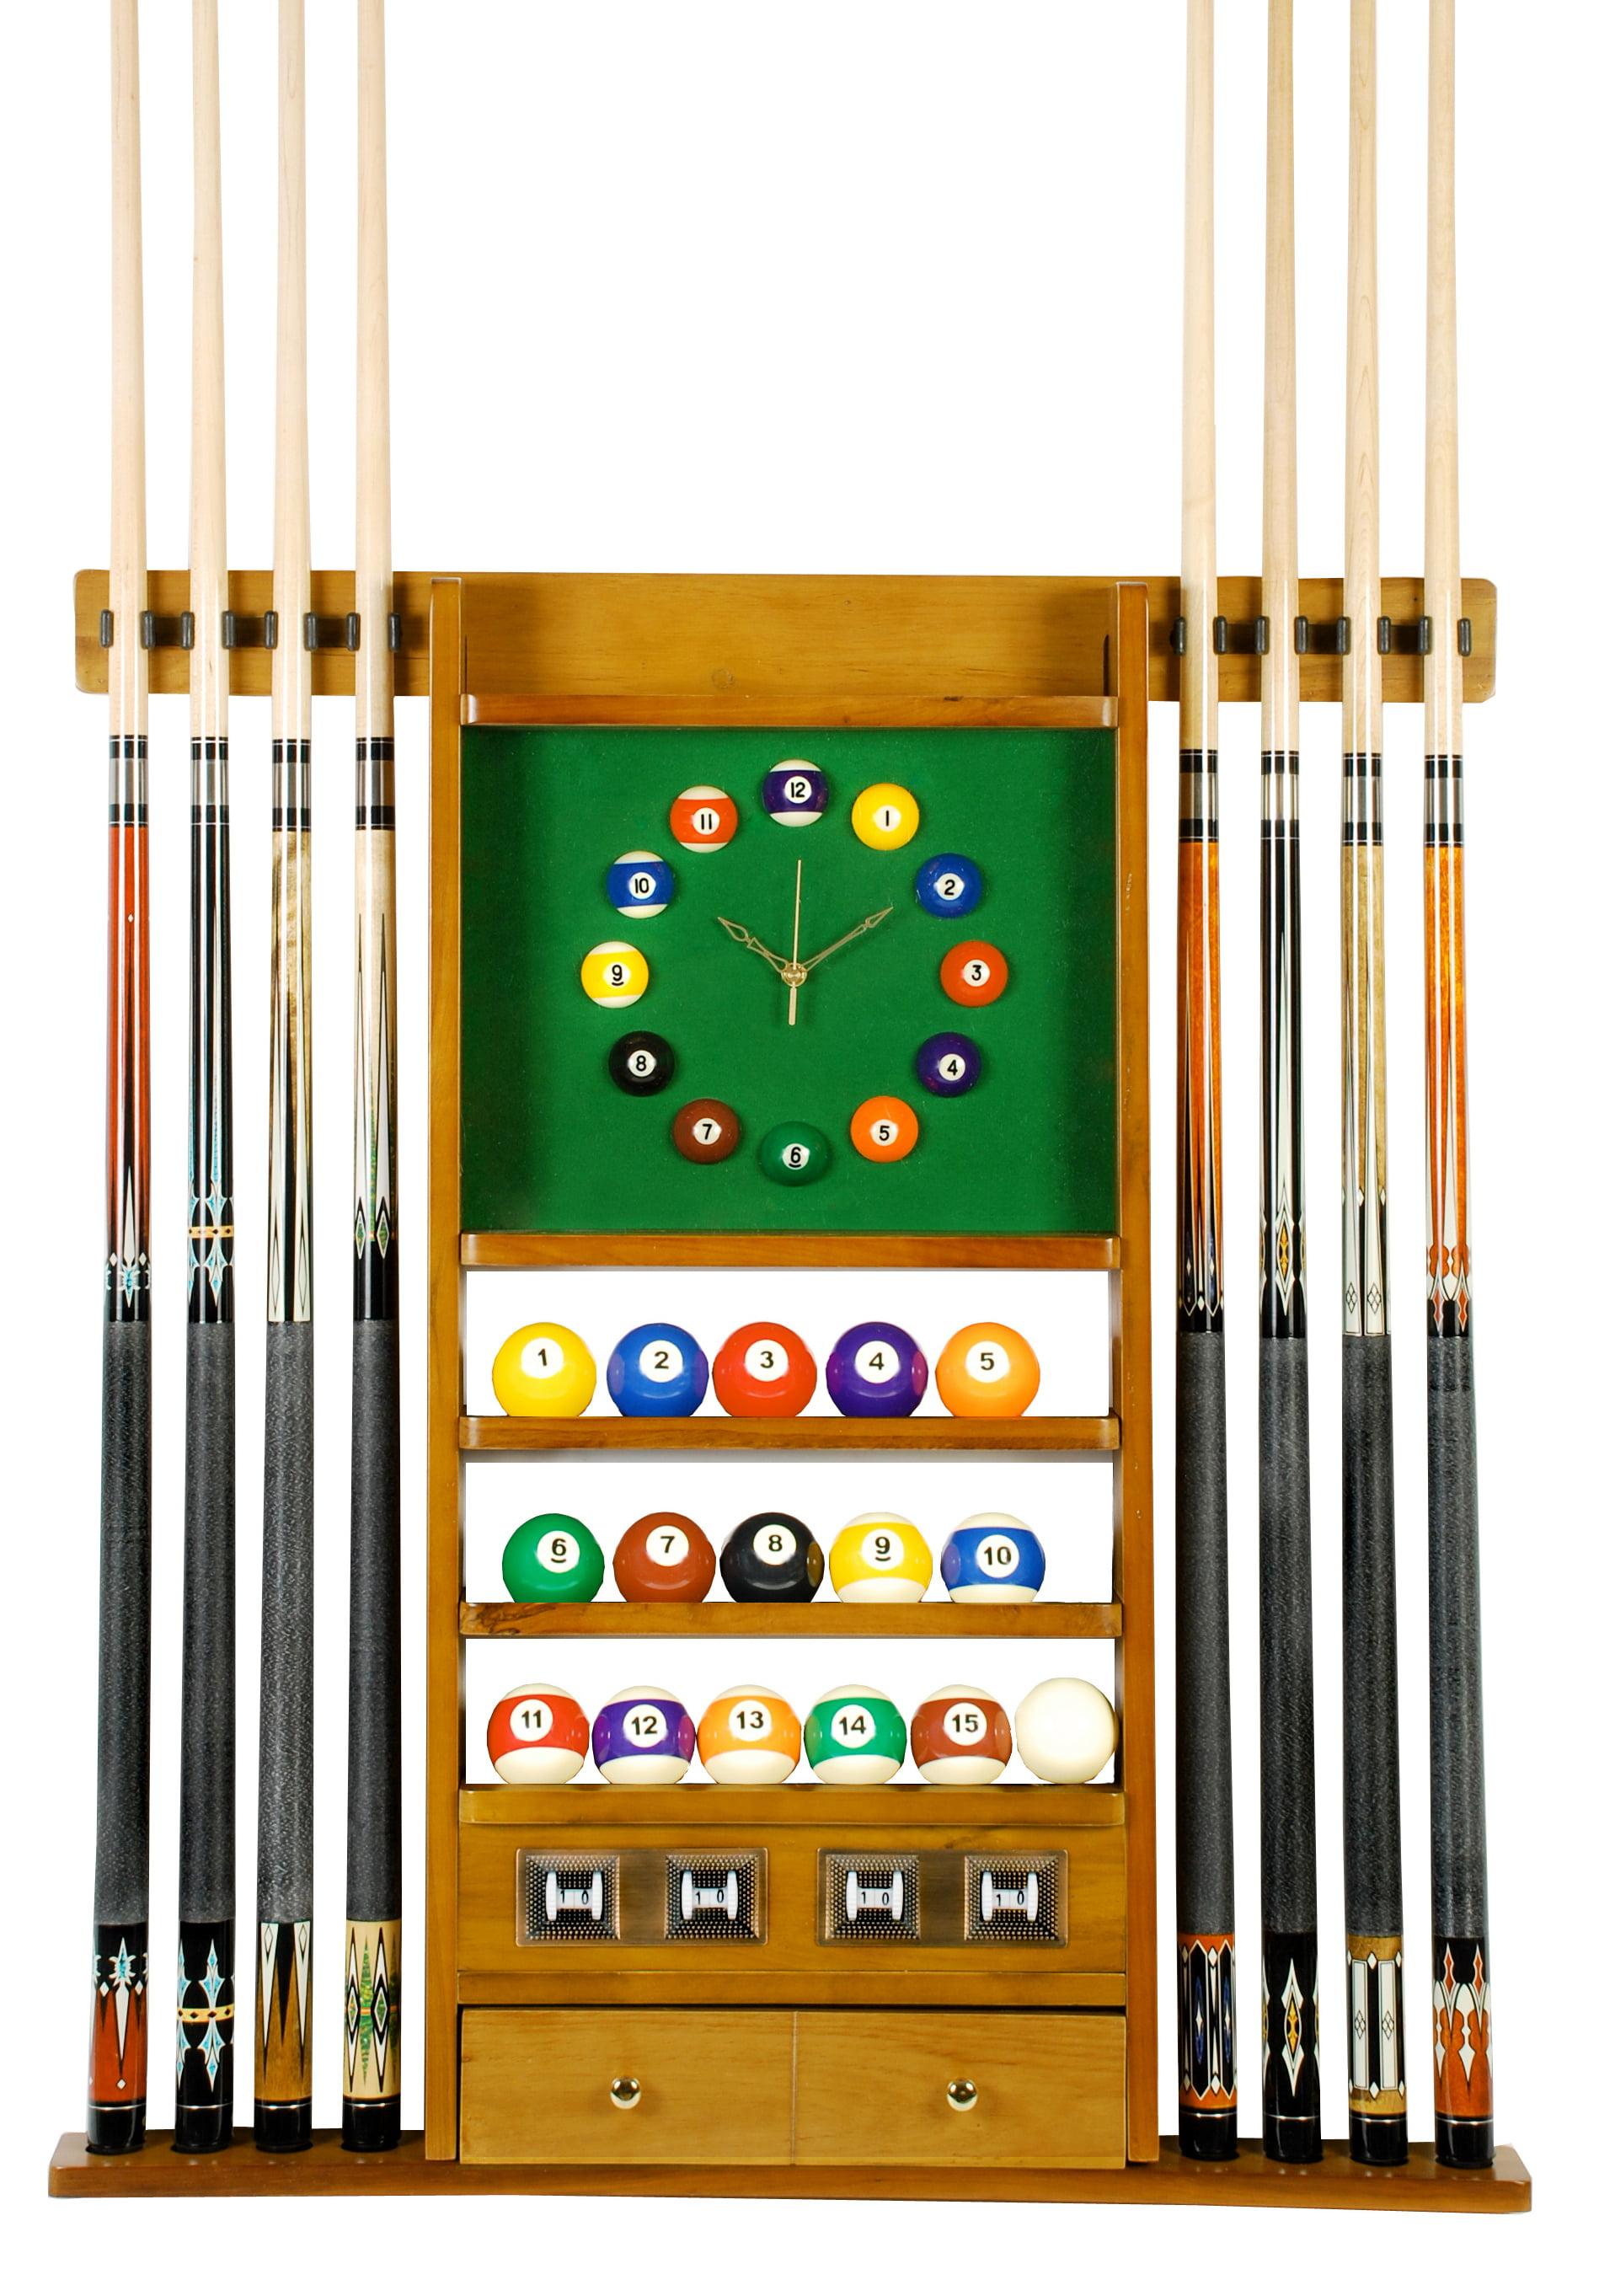 Cue Rack Only 8 Pool Billiard Stick & Ball Set Wall Rack W Clock Oak Finish by